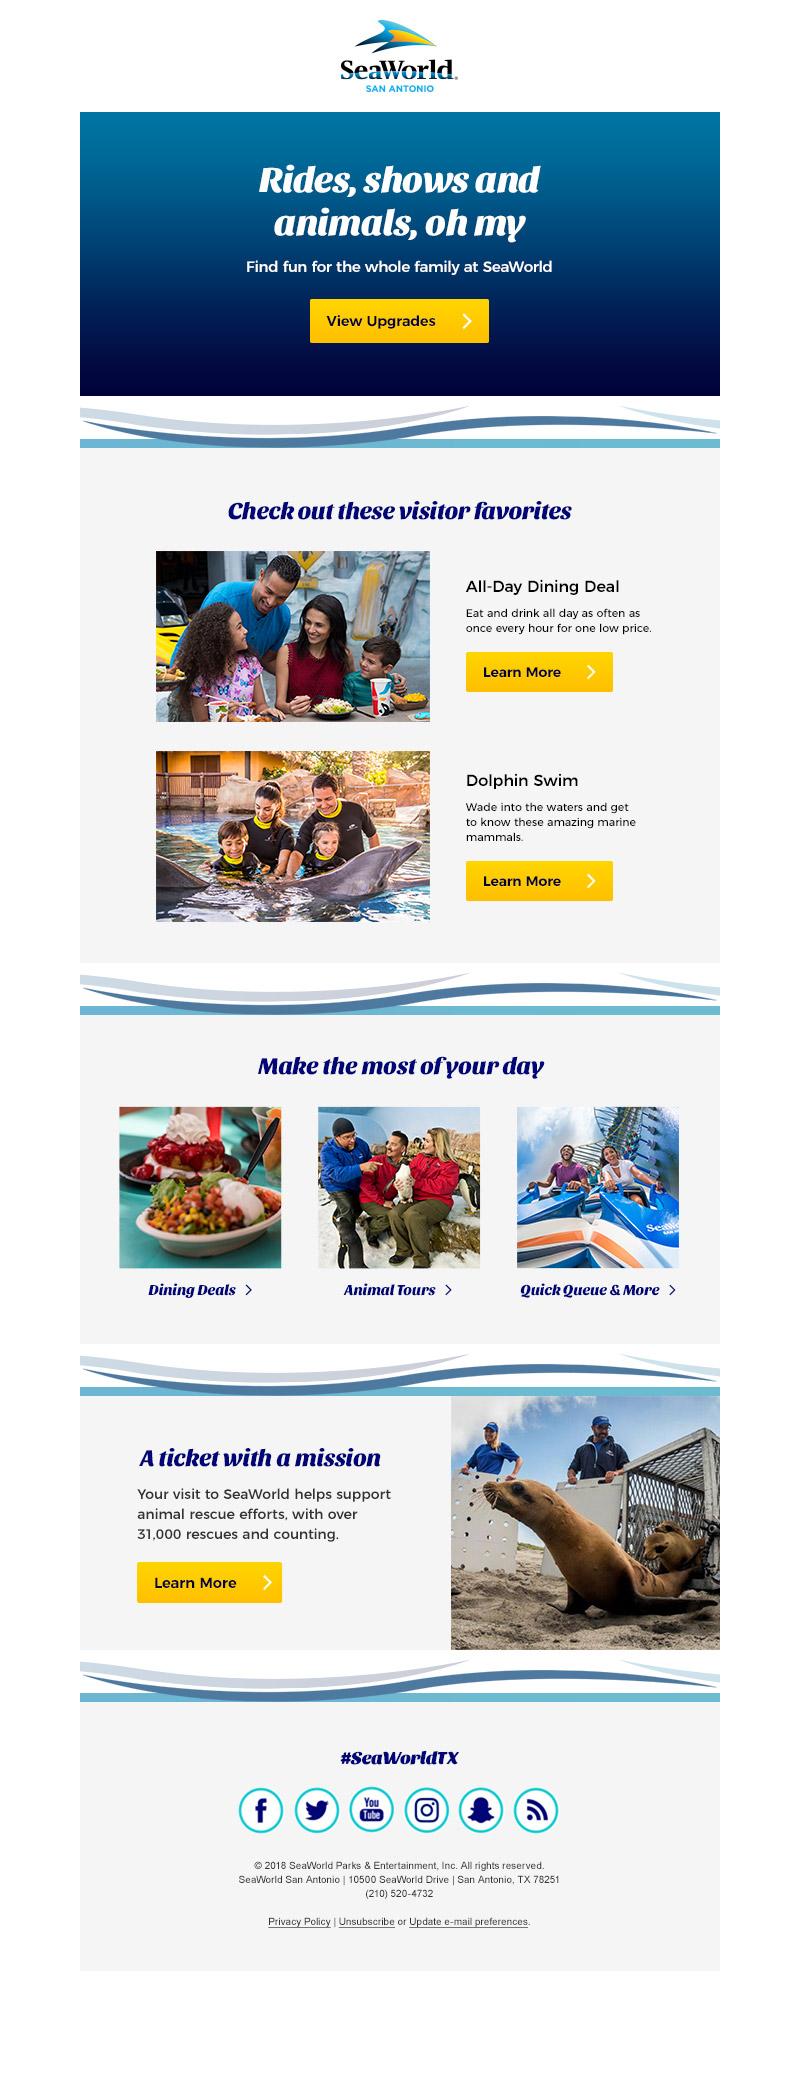 Post purchase upgrade email (SeaWorld San Antonio)